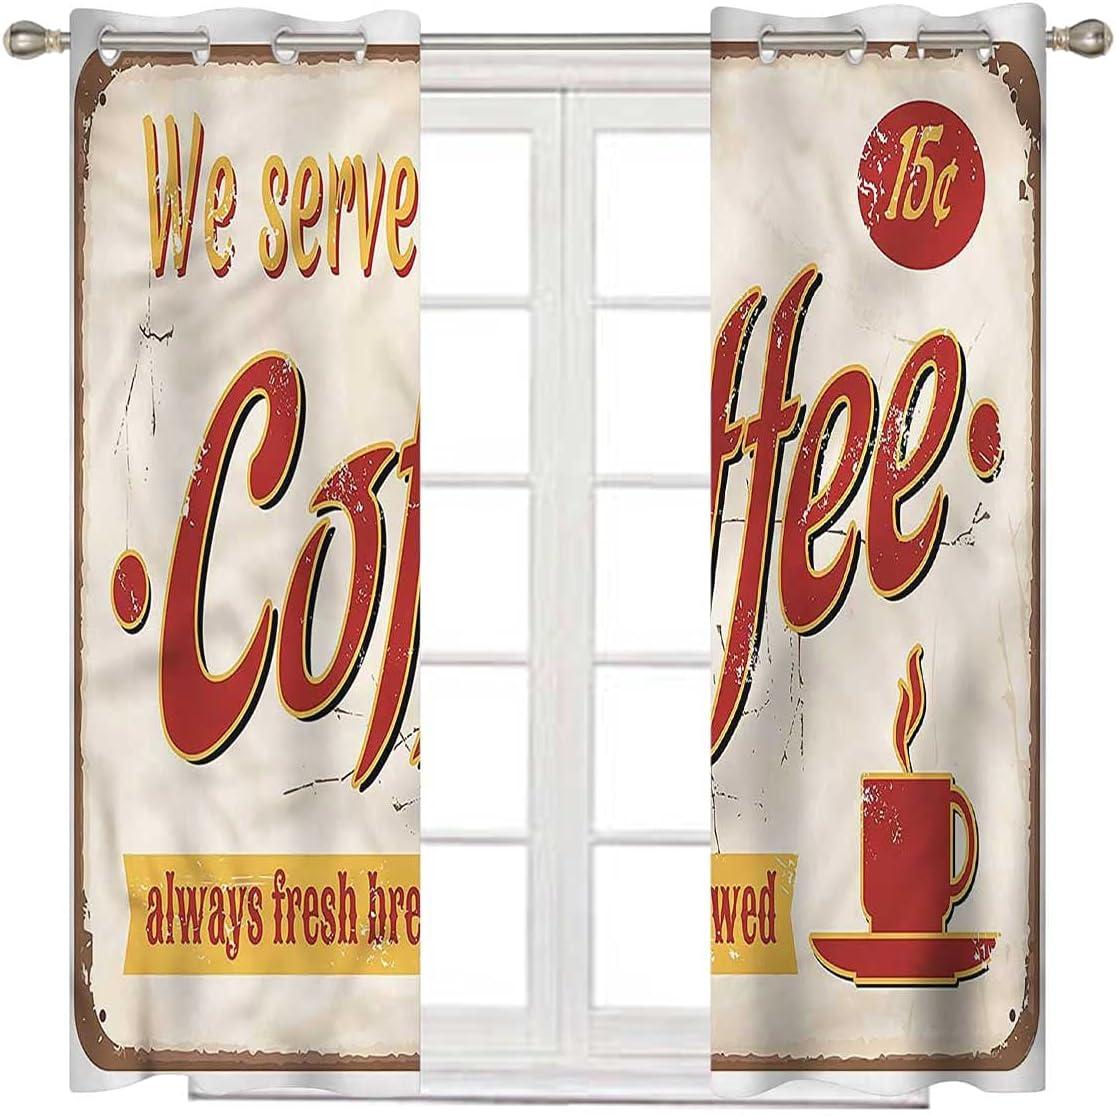 Retro Omaha Mall Short Curtain 72 Inch Ranking TOP1 Long Tin Rusty Faded B Vintage Light